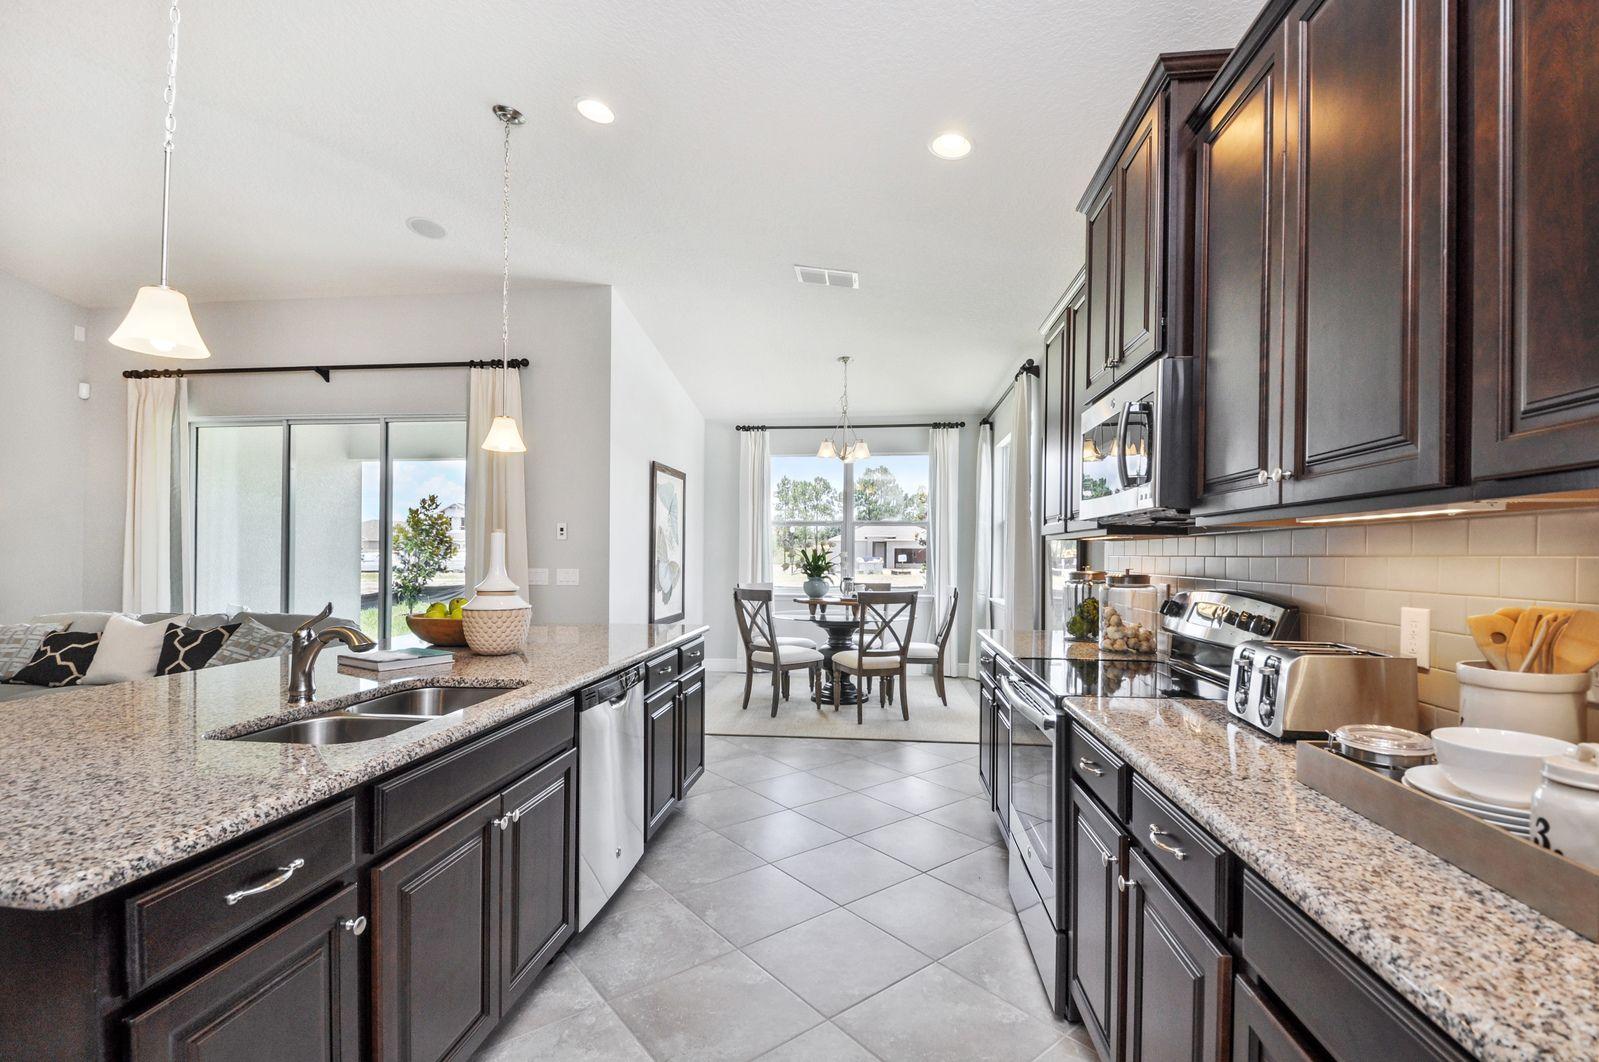 Kitchen-in-Biscayne Bay-at-Serenoa-in-Clermont